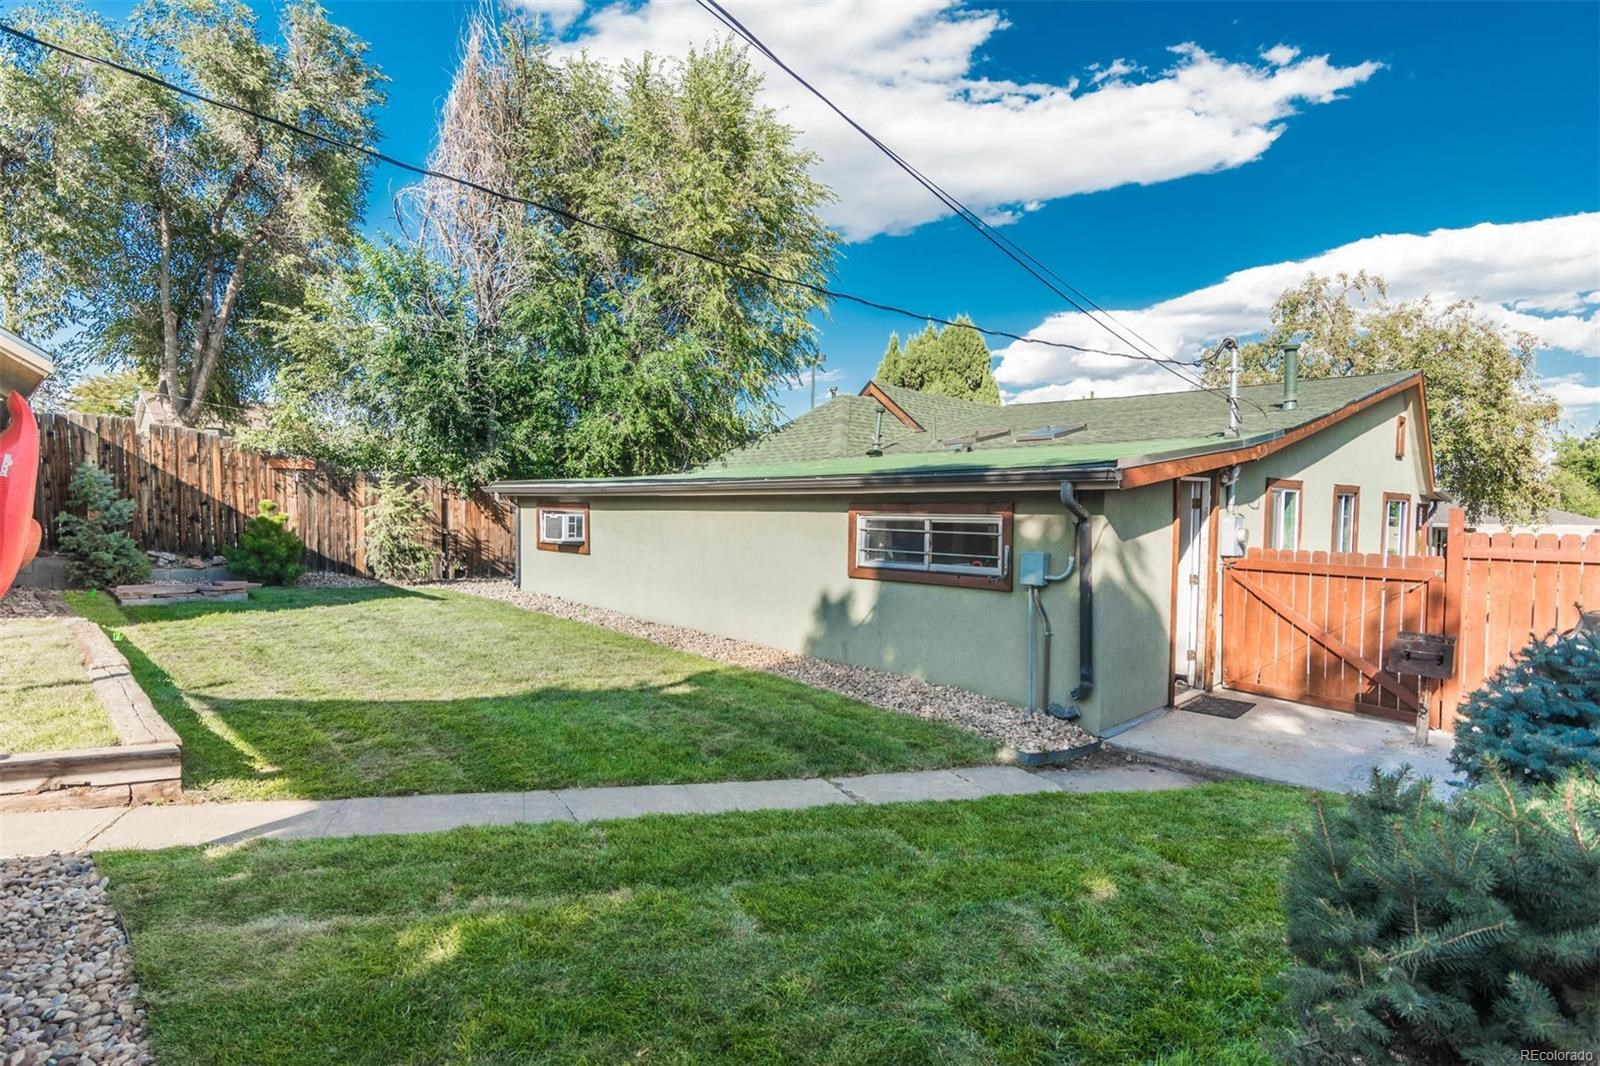 MLS# 2332871 - 33 - 143 S Perry Street, Denver, CO 80219